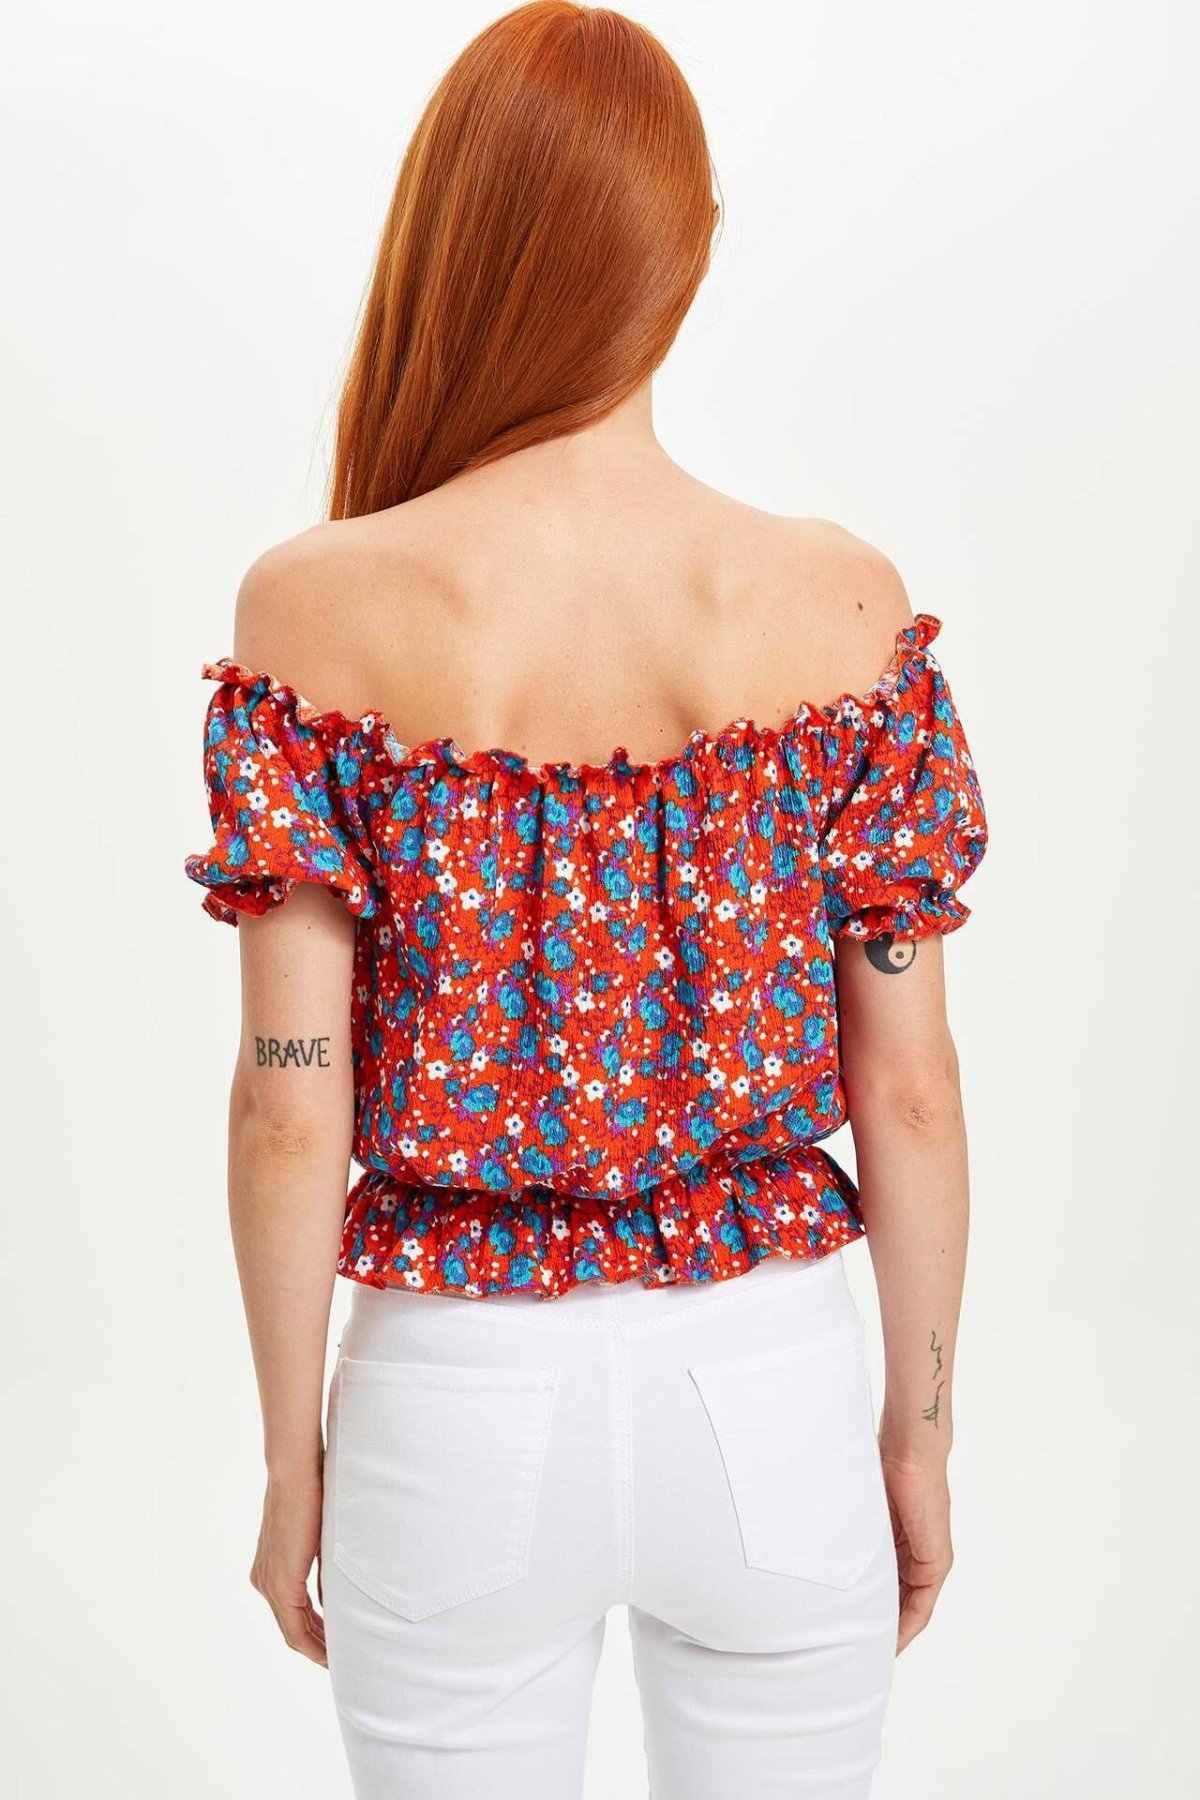 Defacto Fashion Wanita Atasan Wanita Kasual Longgar Bahu Lengan Pendek Wanita Cetak T-shirt Musim Panas Baru-M3329AZ19AU